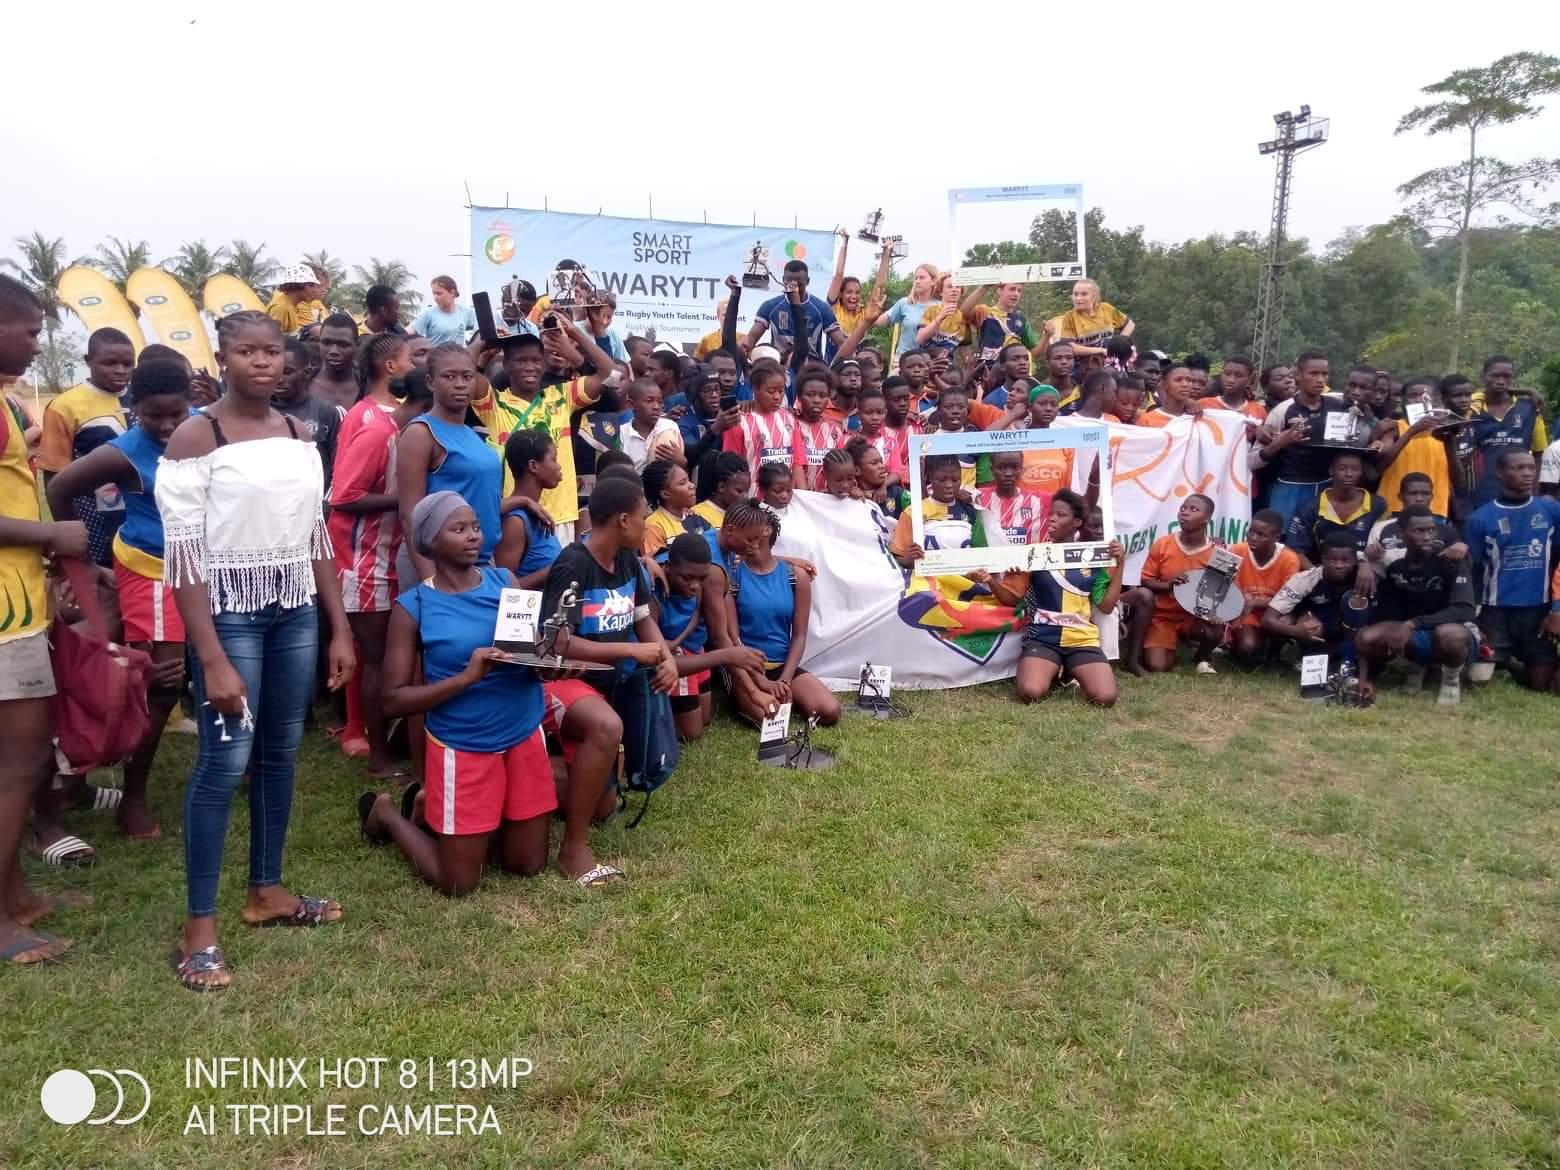 Rugby,Waritt,Ivoire Académie